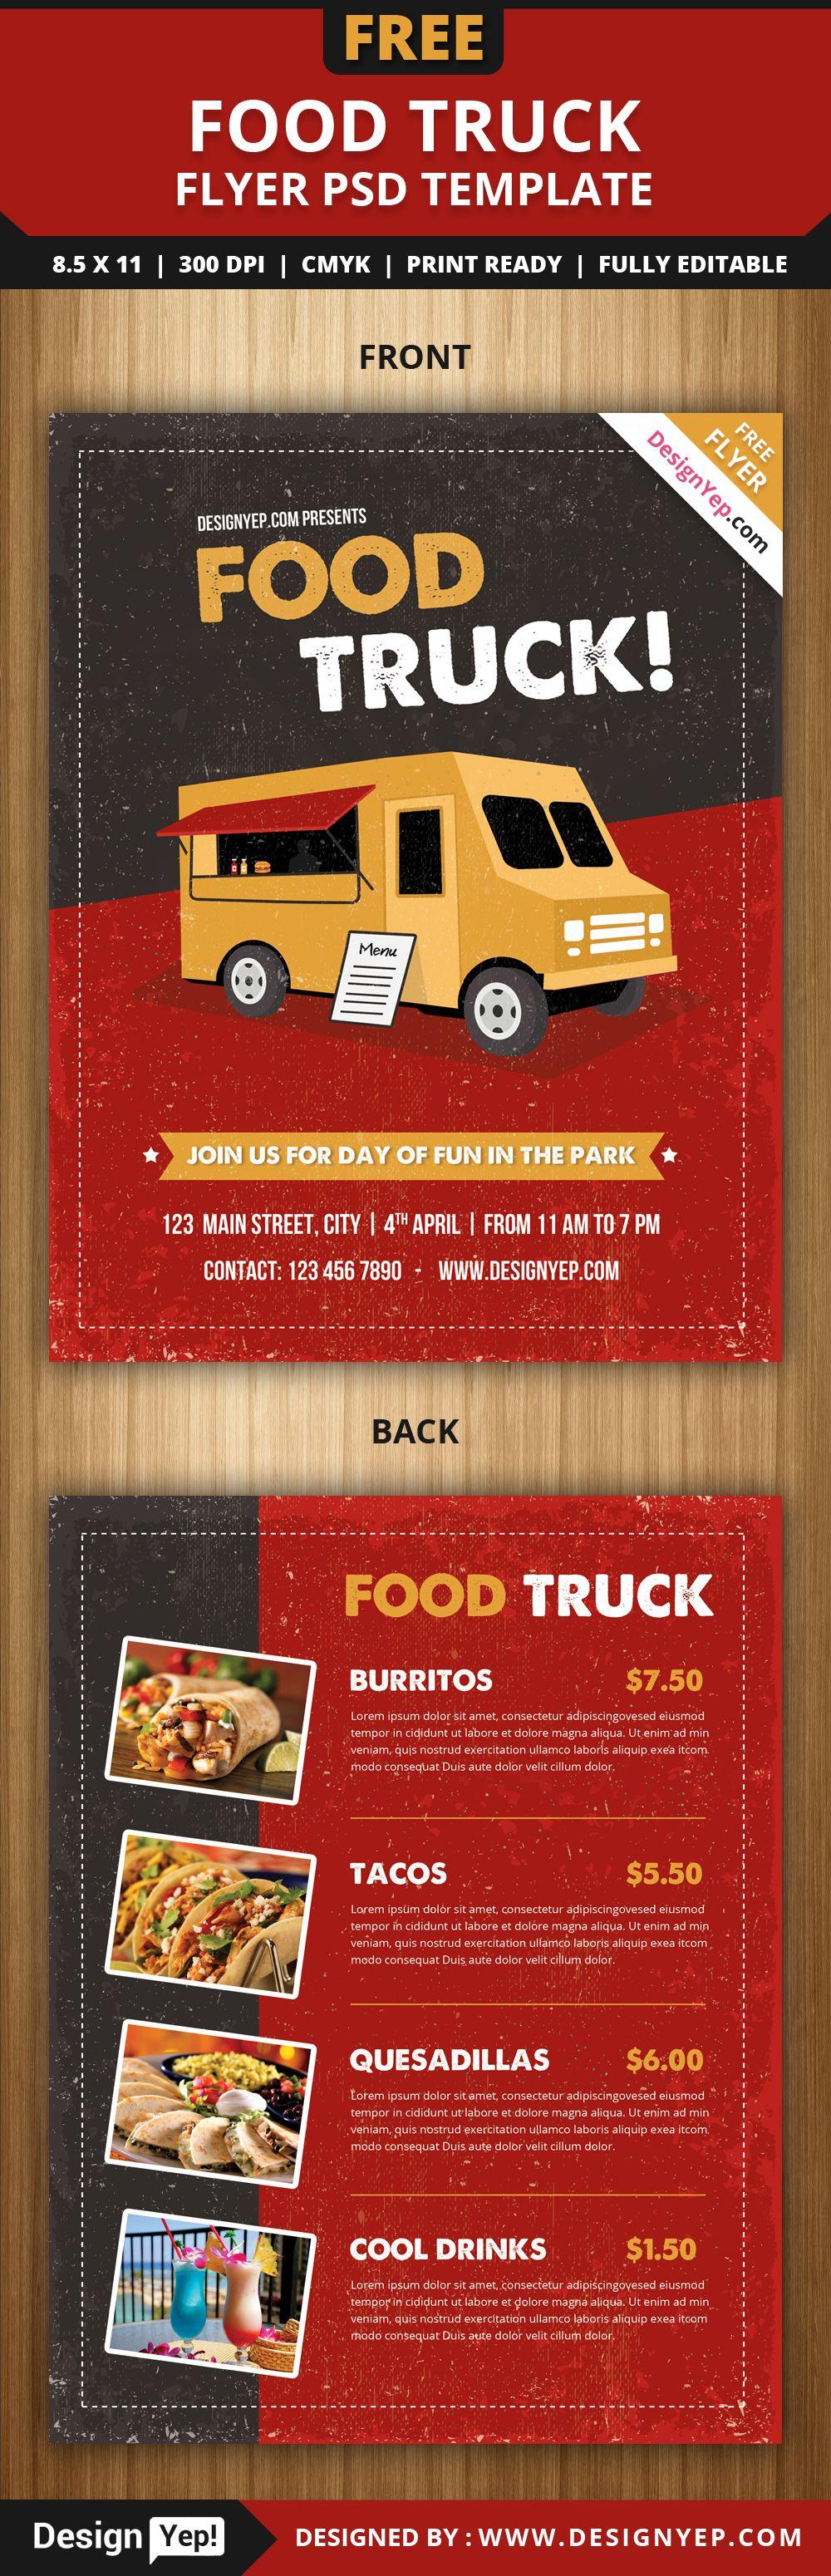 free food truck flyer psd template 3131 designyep free flyers